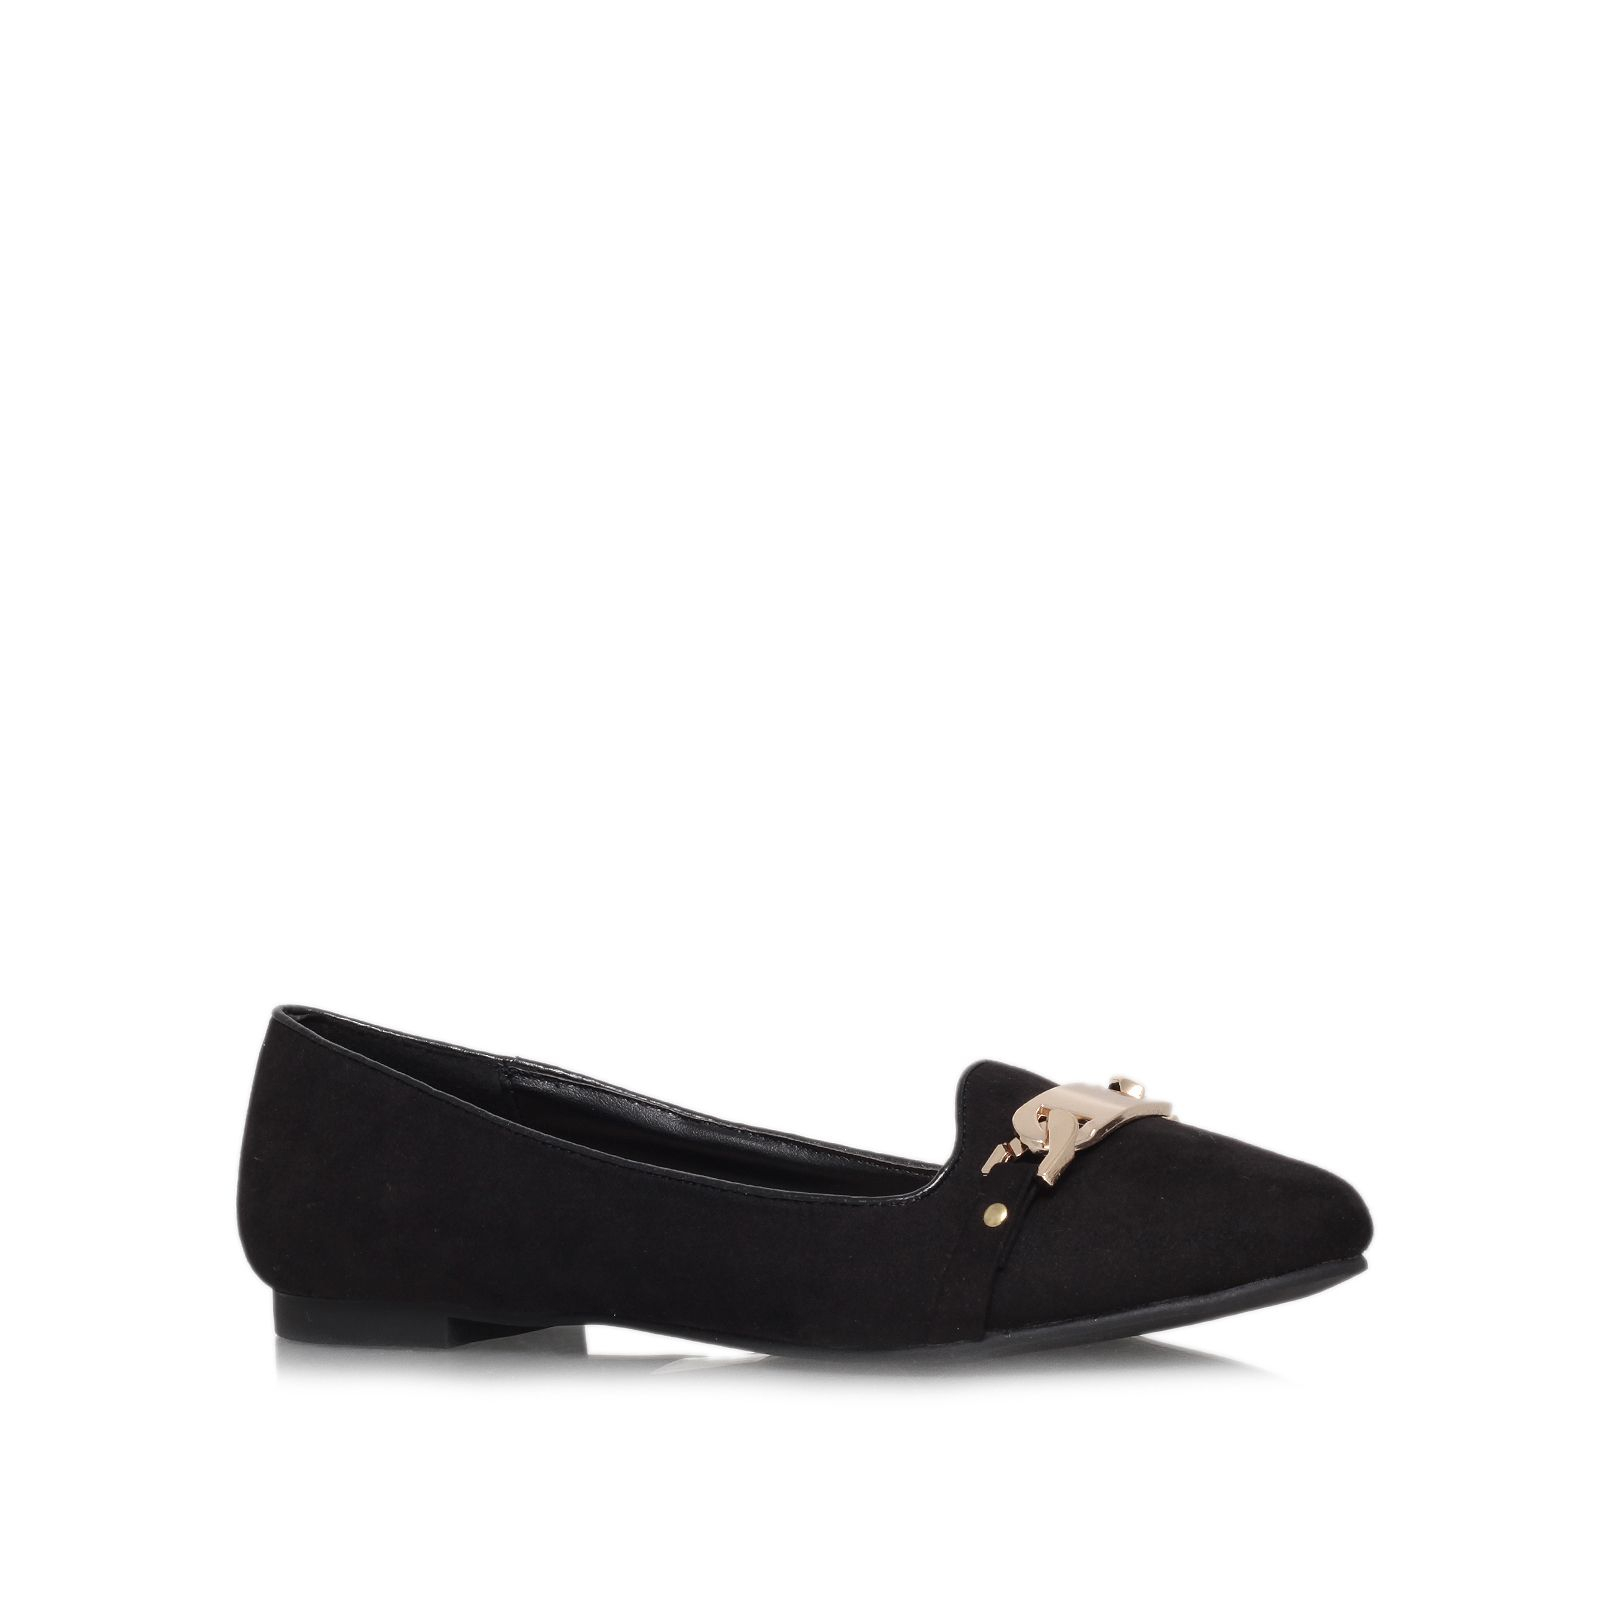 carvela kurt geiger lull flat court shoes in black lyst